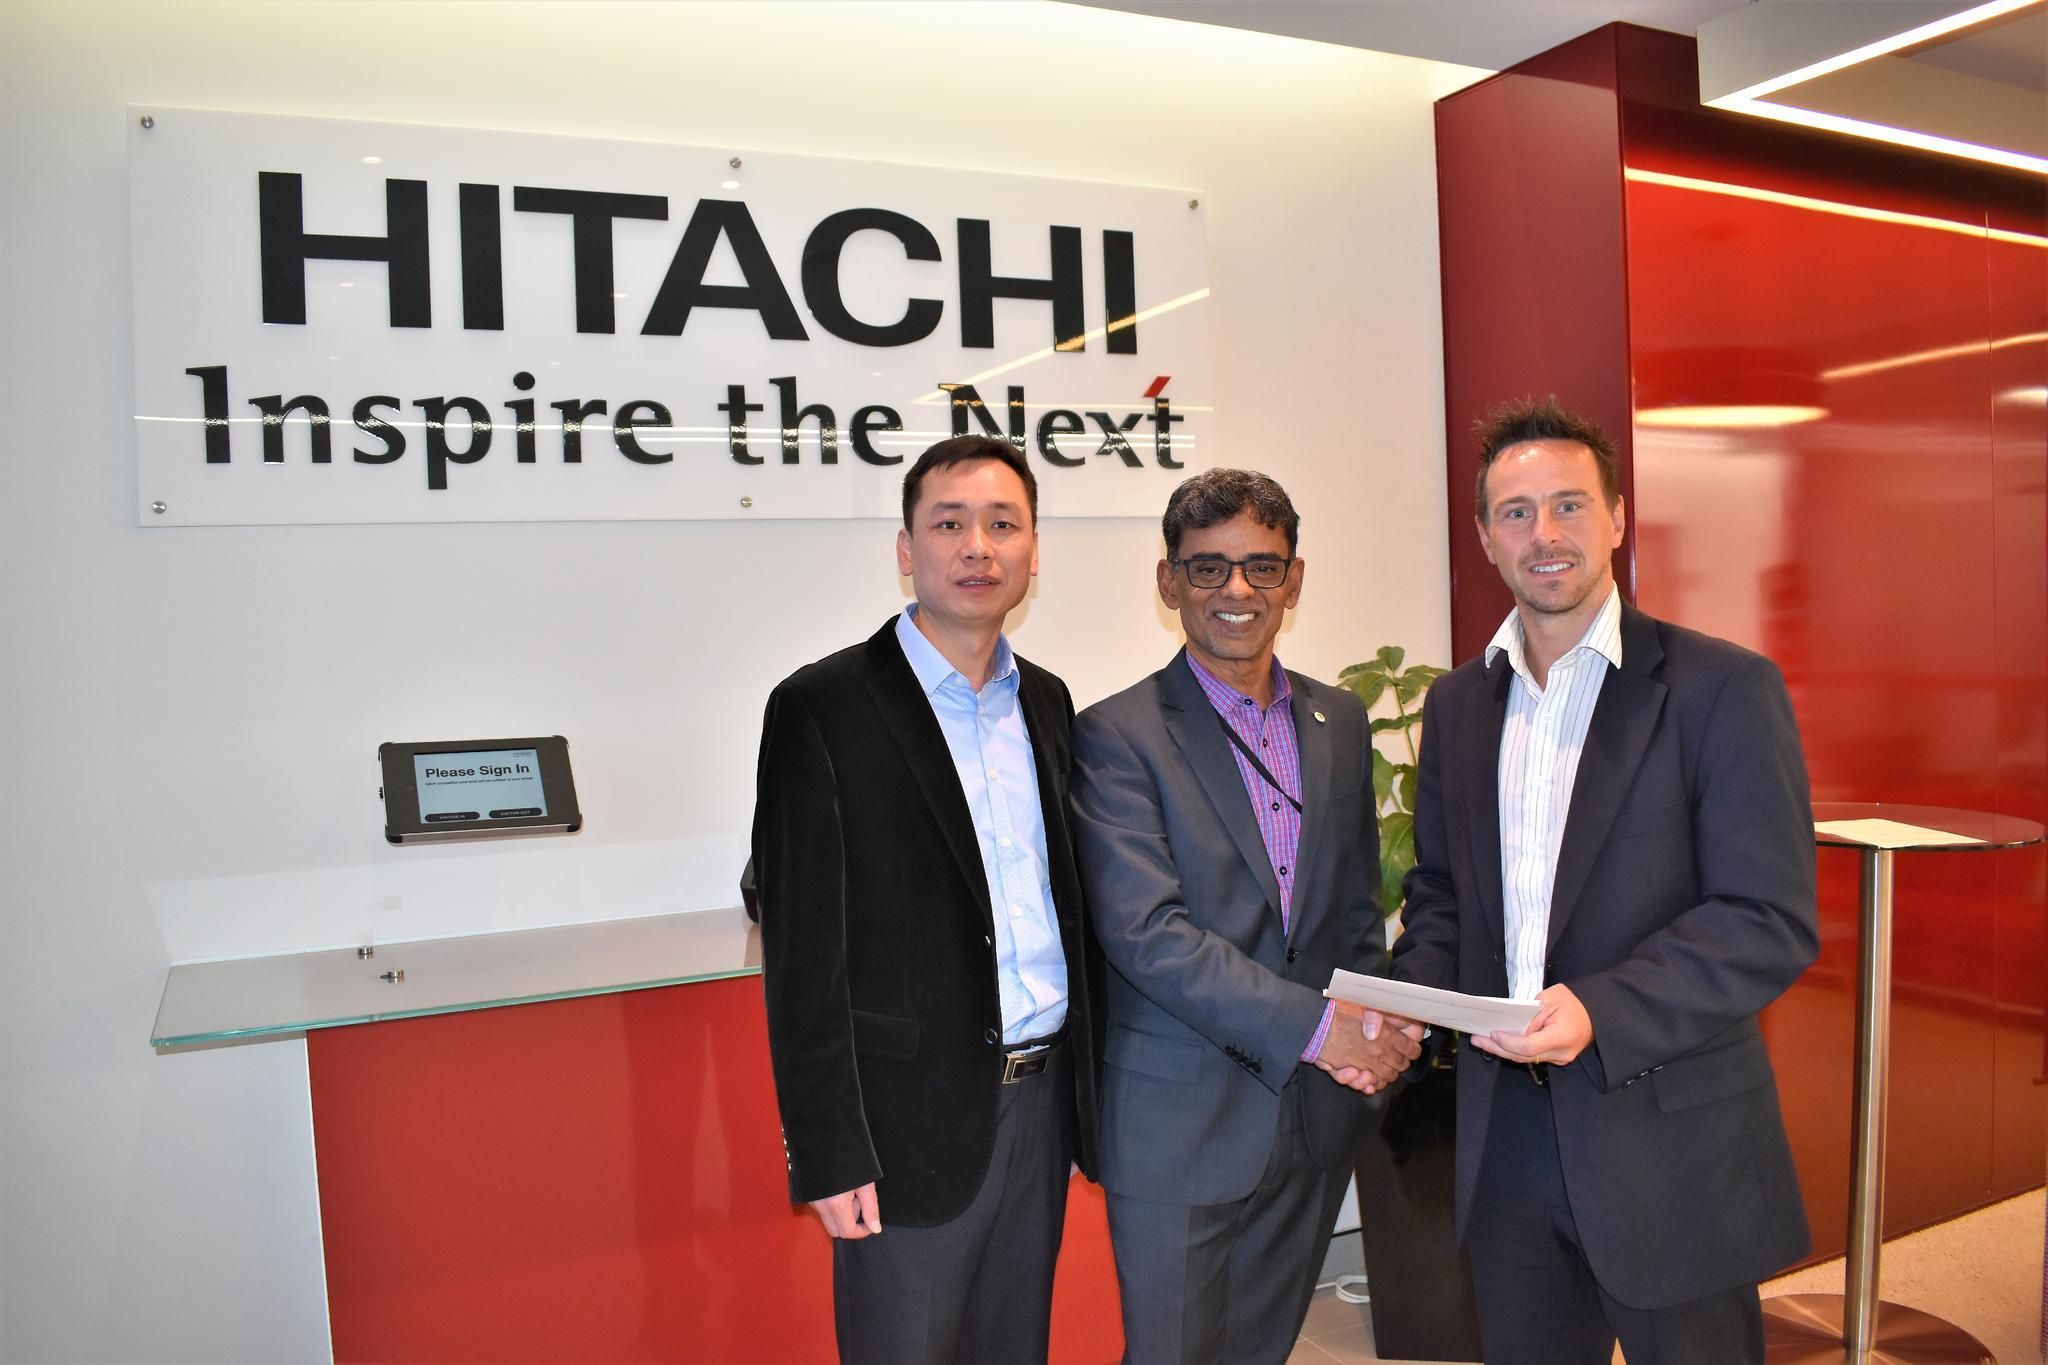 Orbitz Elevators & Hitachi Partnership